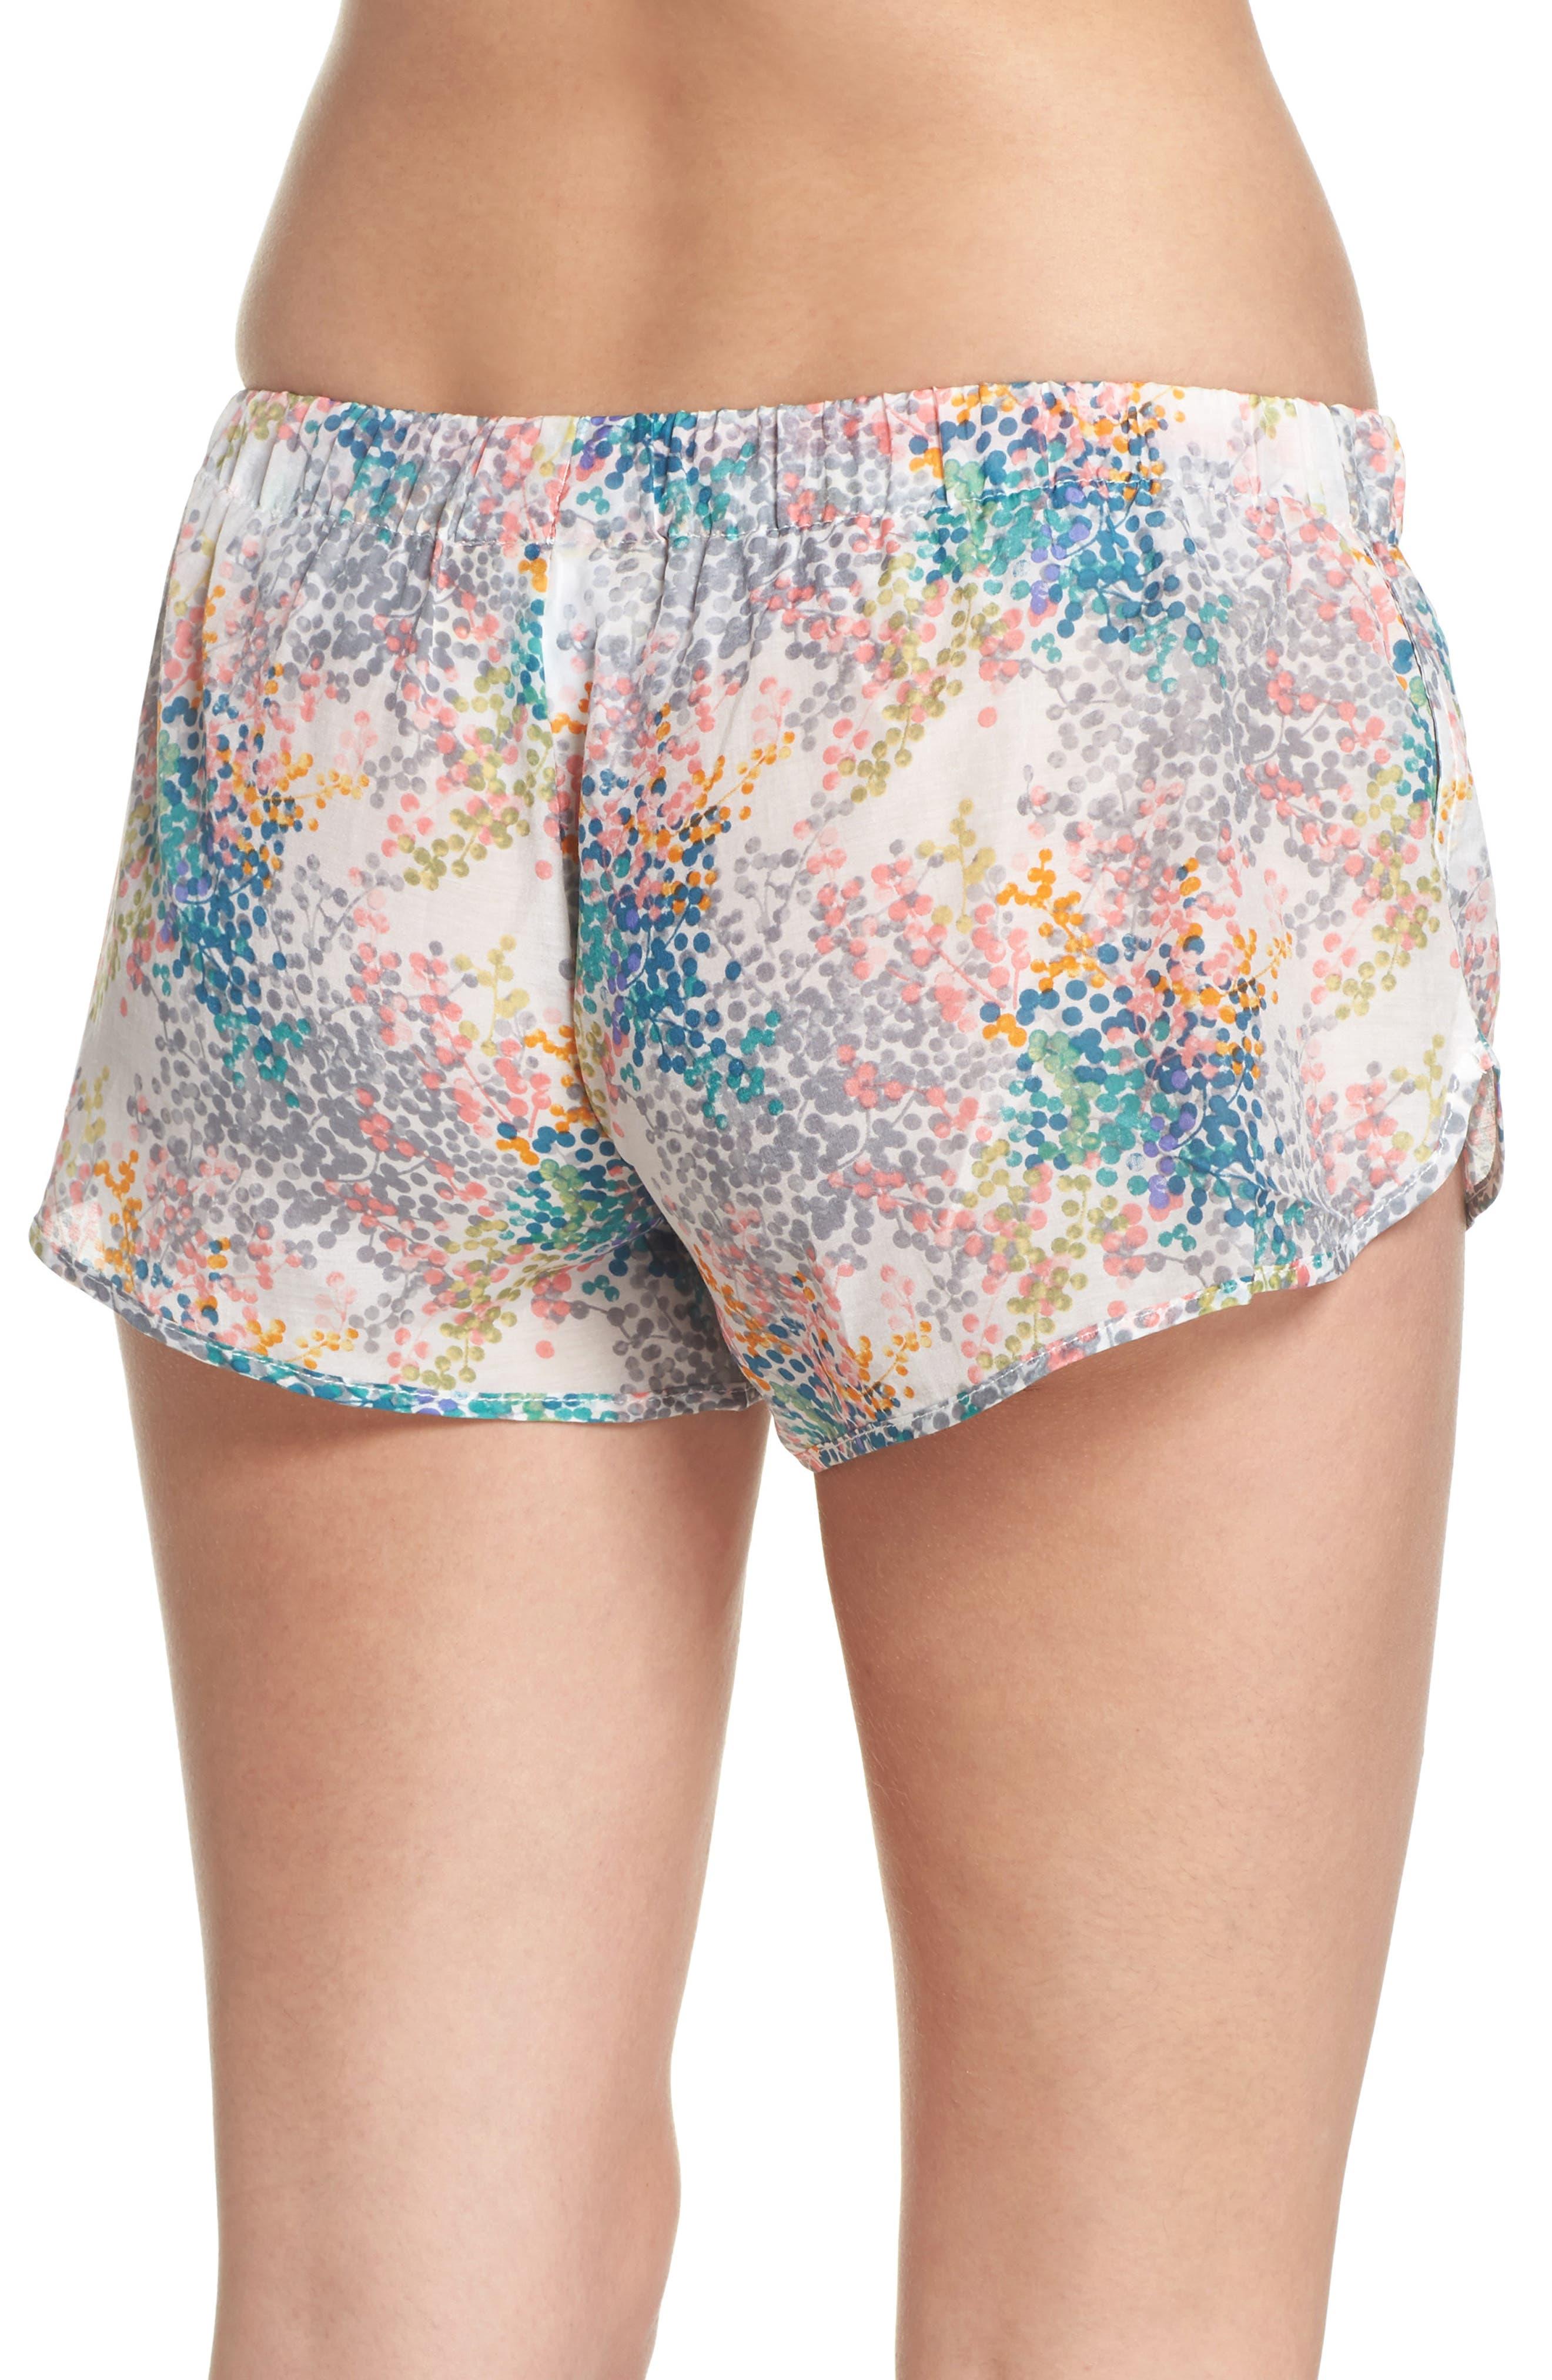 Bouquet Pajama Shorts,                             Alternate thumbnail 2, color,                             BLUE GREEN